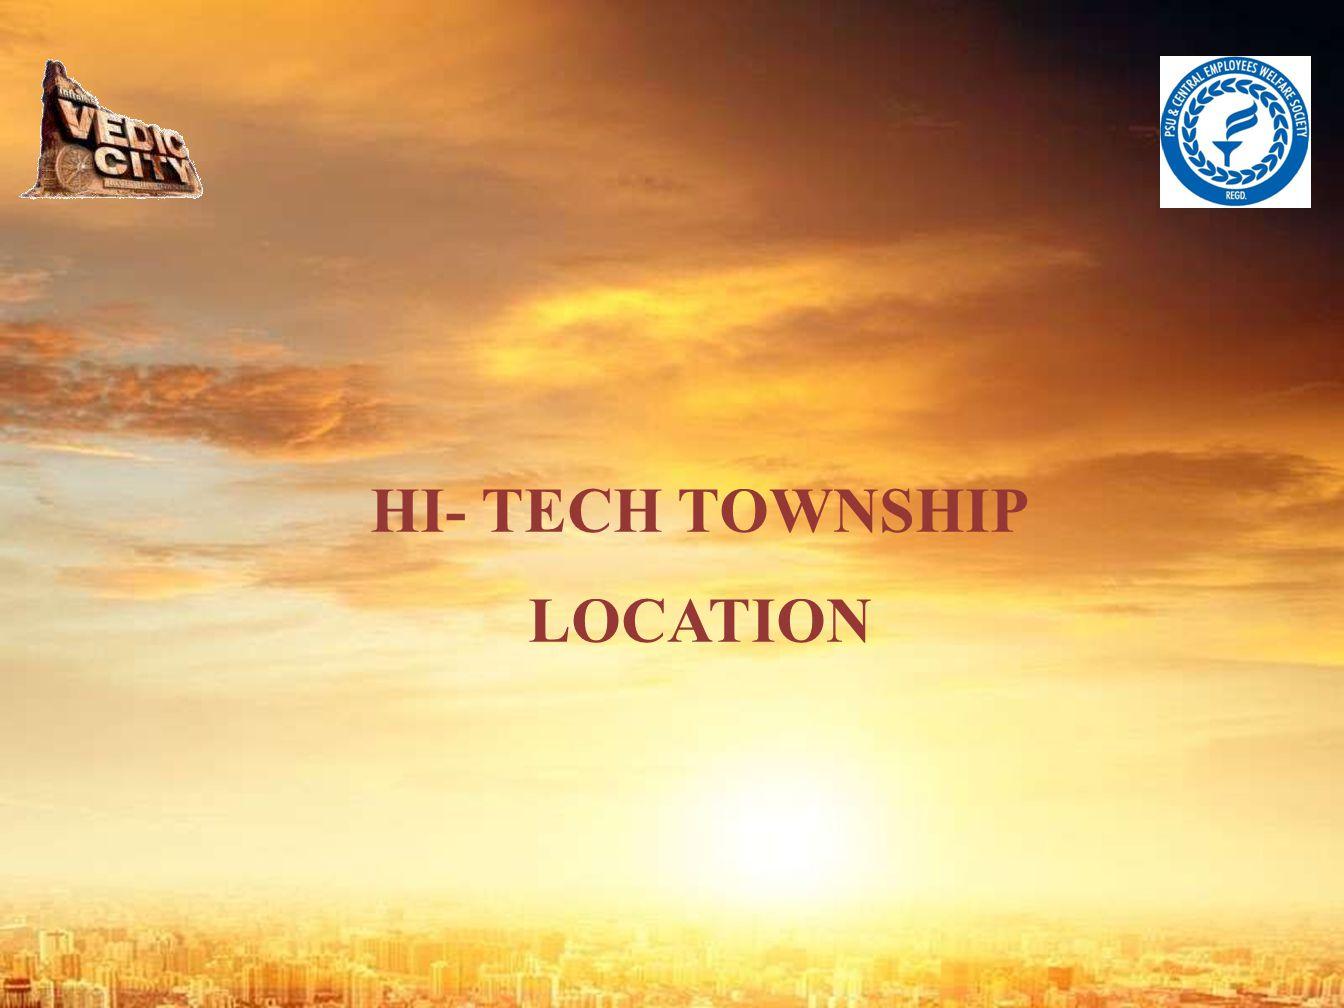 HI- TECH TOWNSHIP LOCATION